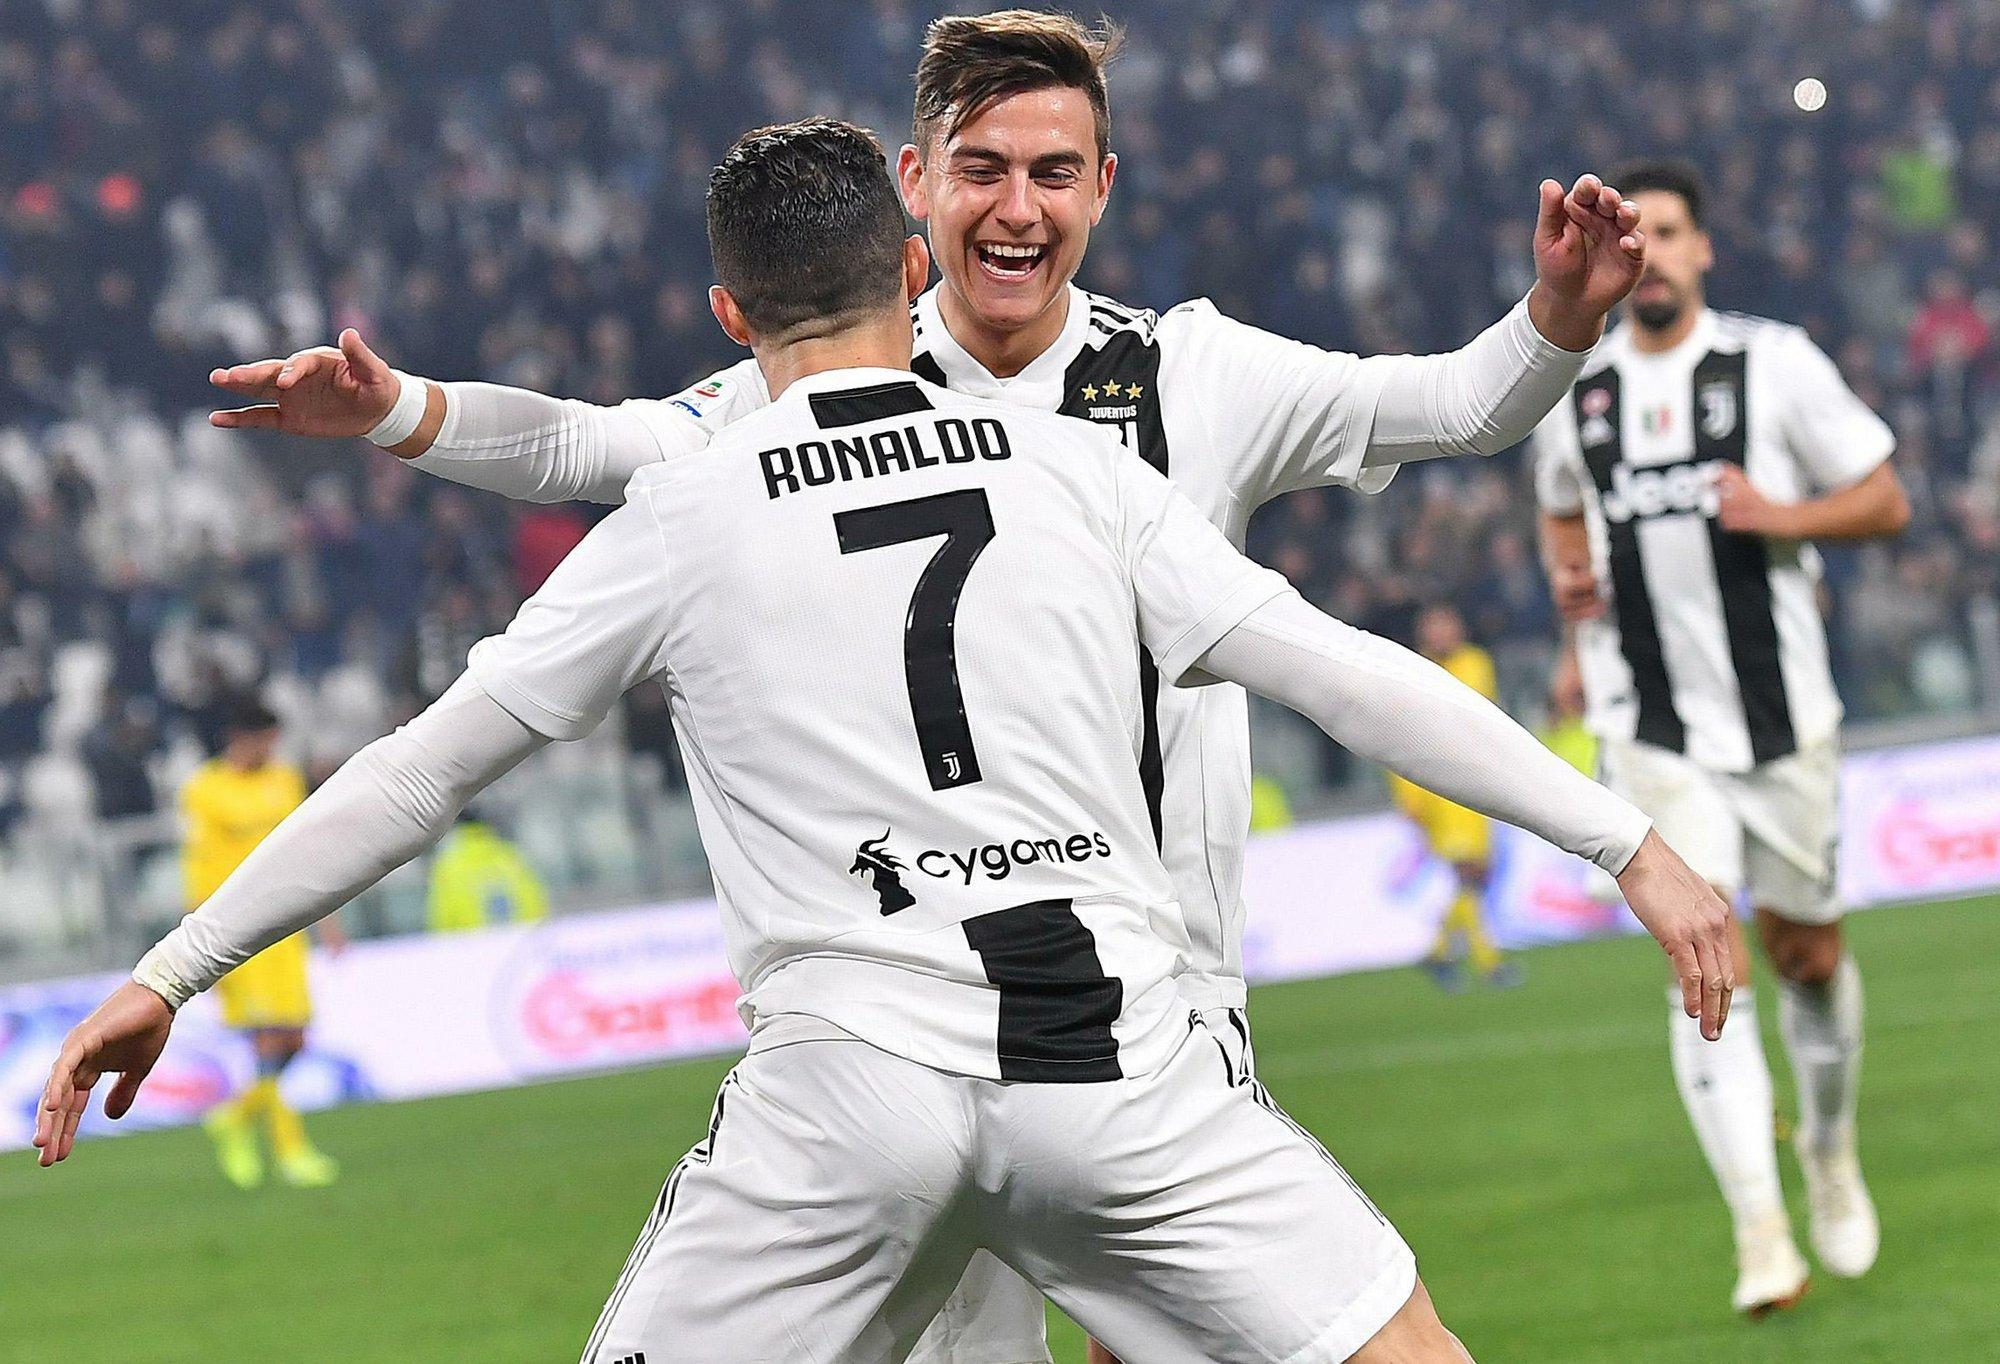 6f958953c615 Joint celebration shows growing Ronaldo